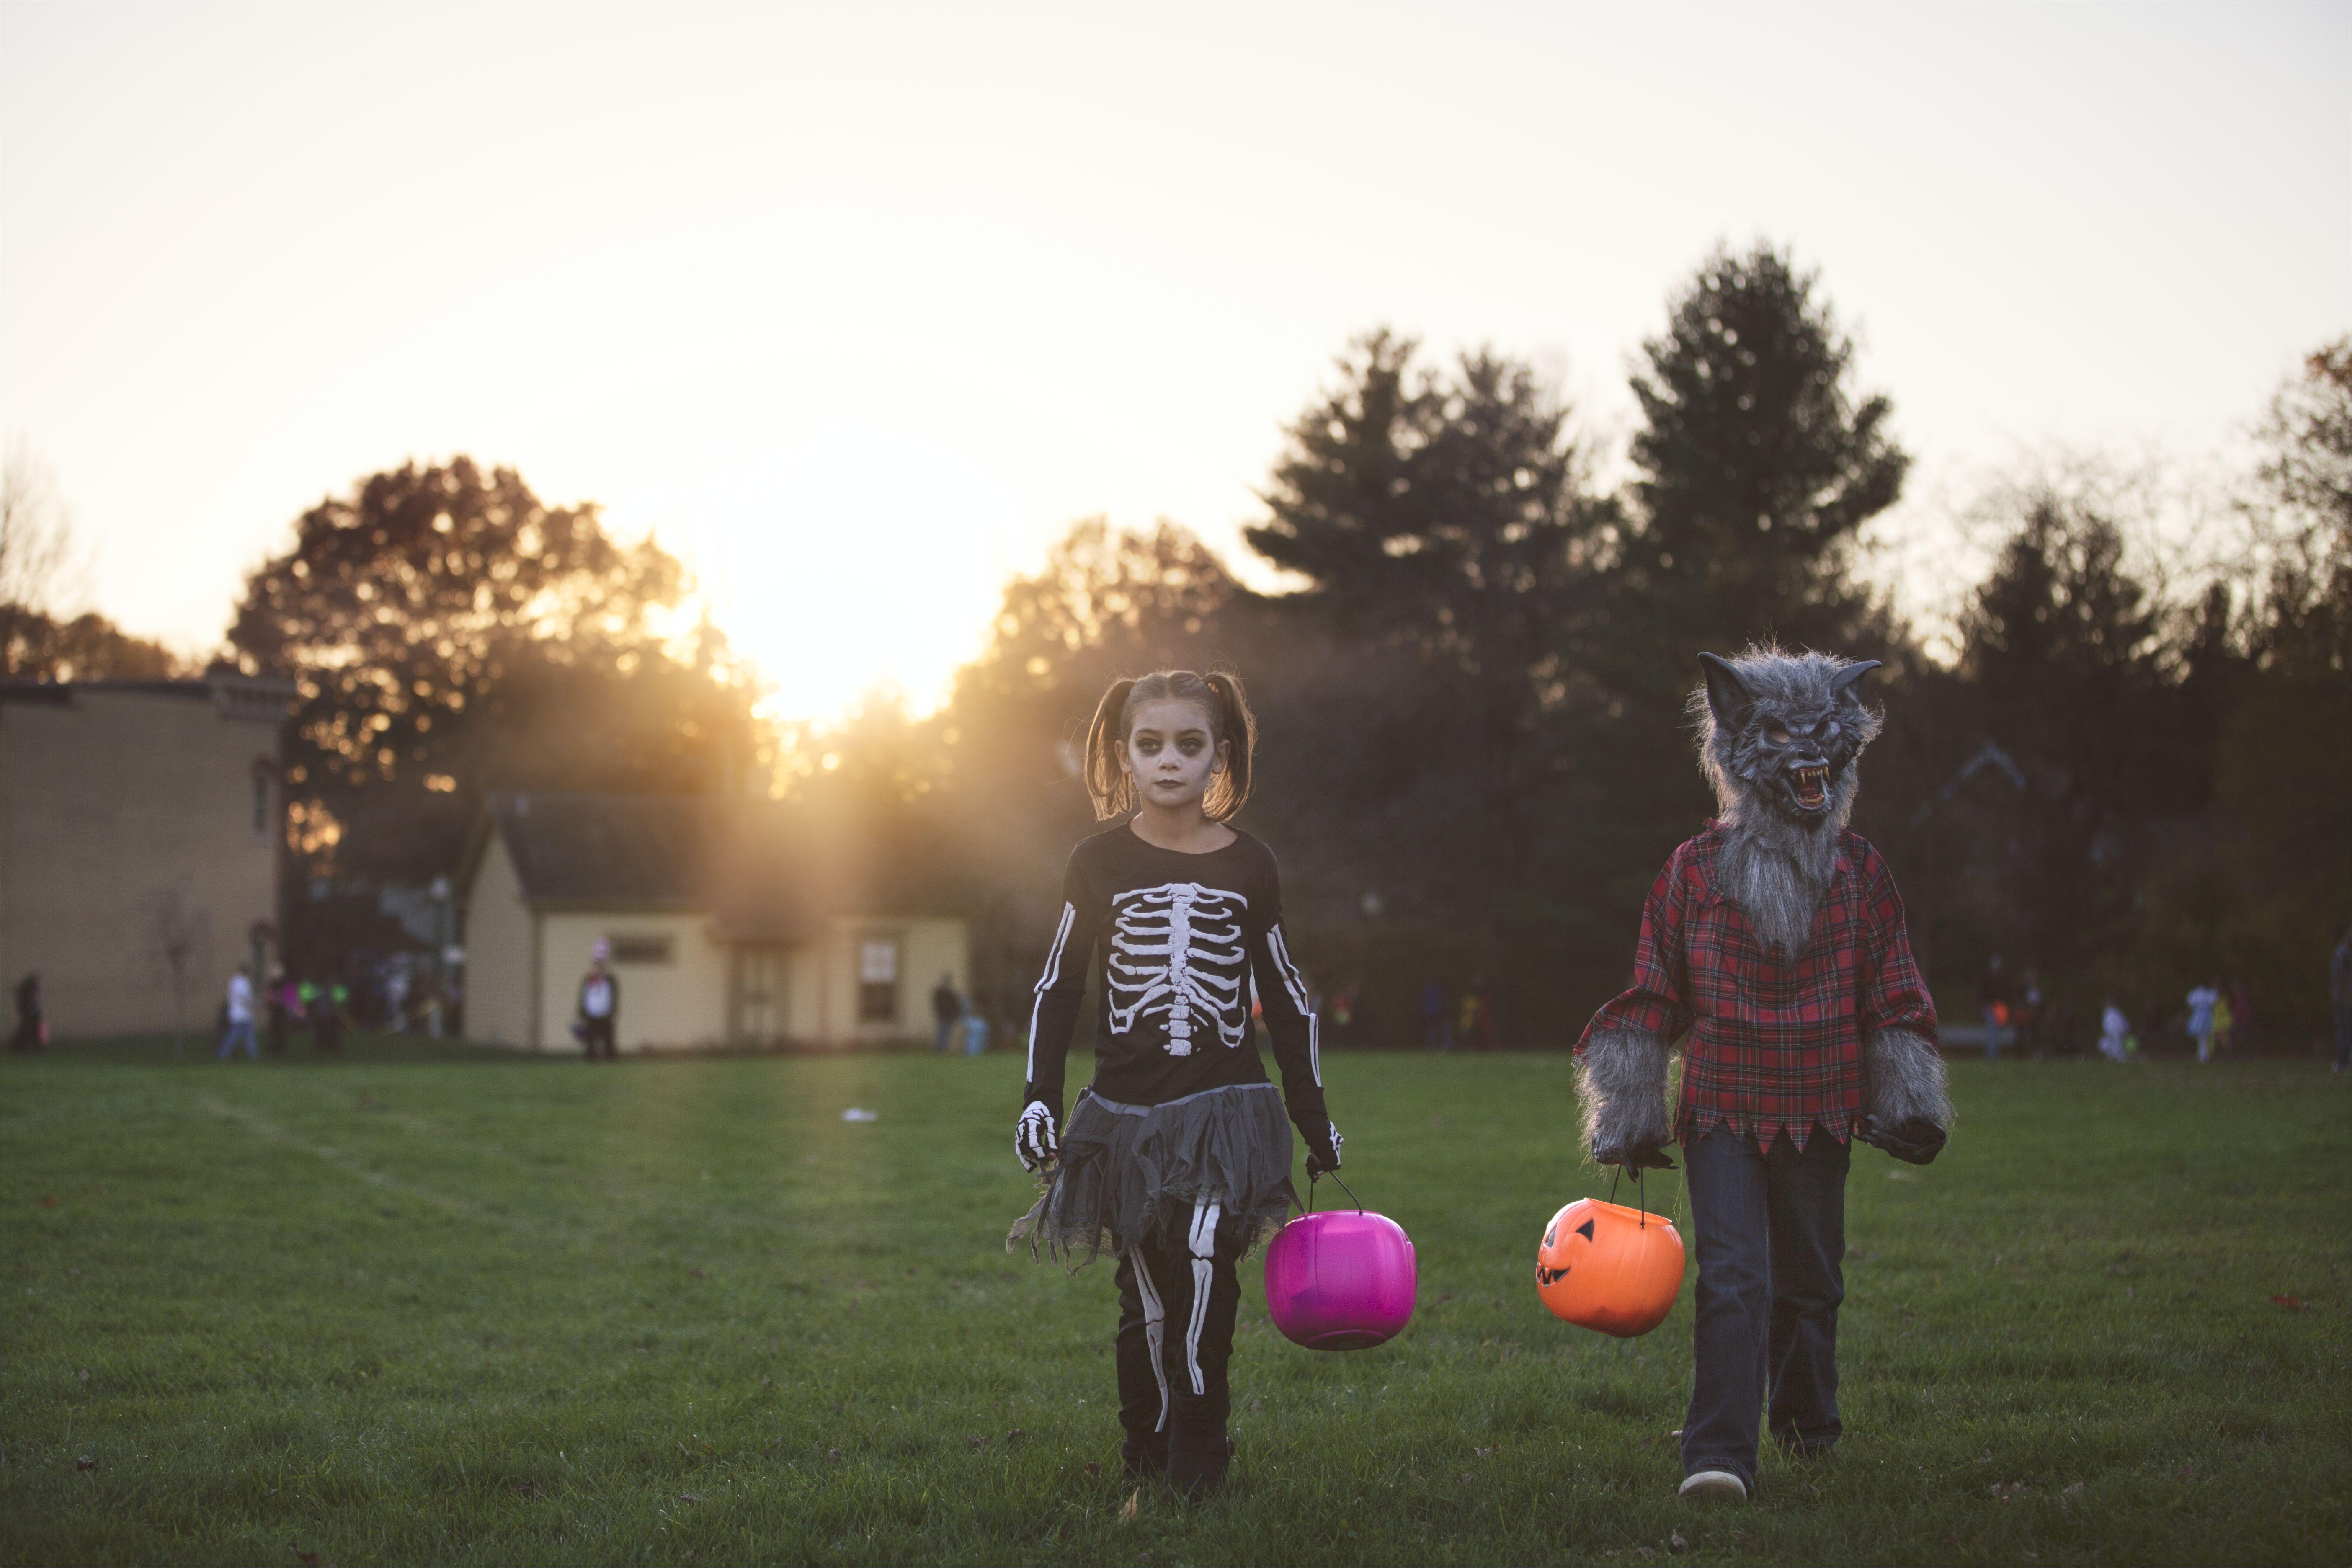 costumed children walking across grassy field 522825703 5a28c2b99e94270037c09613 jpg